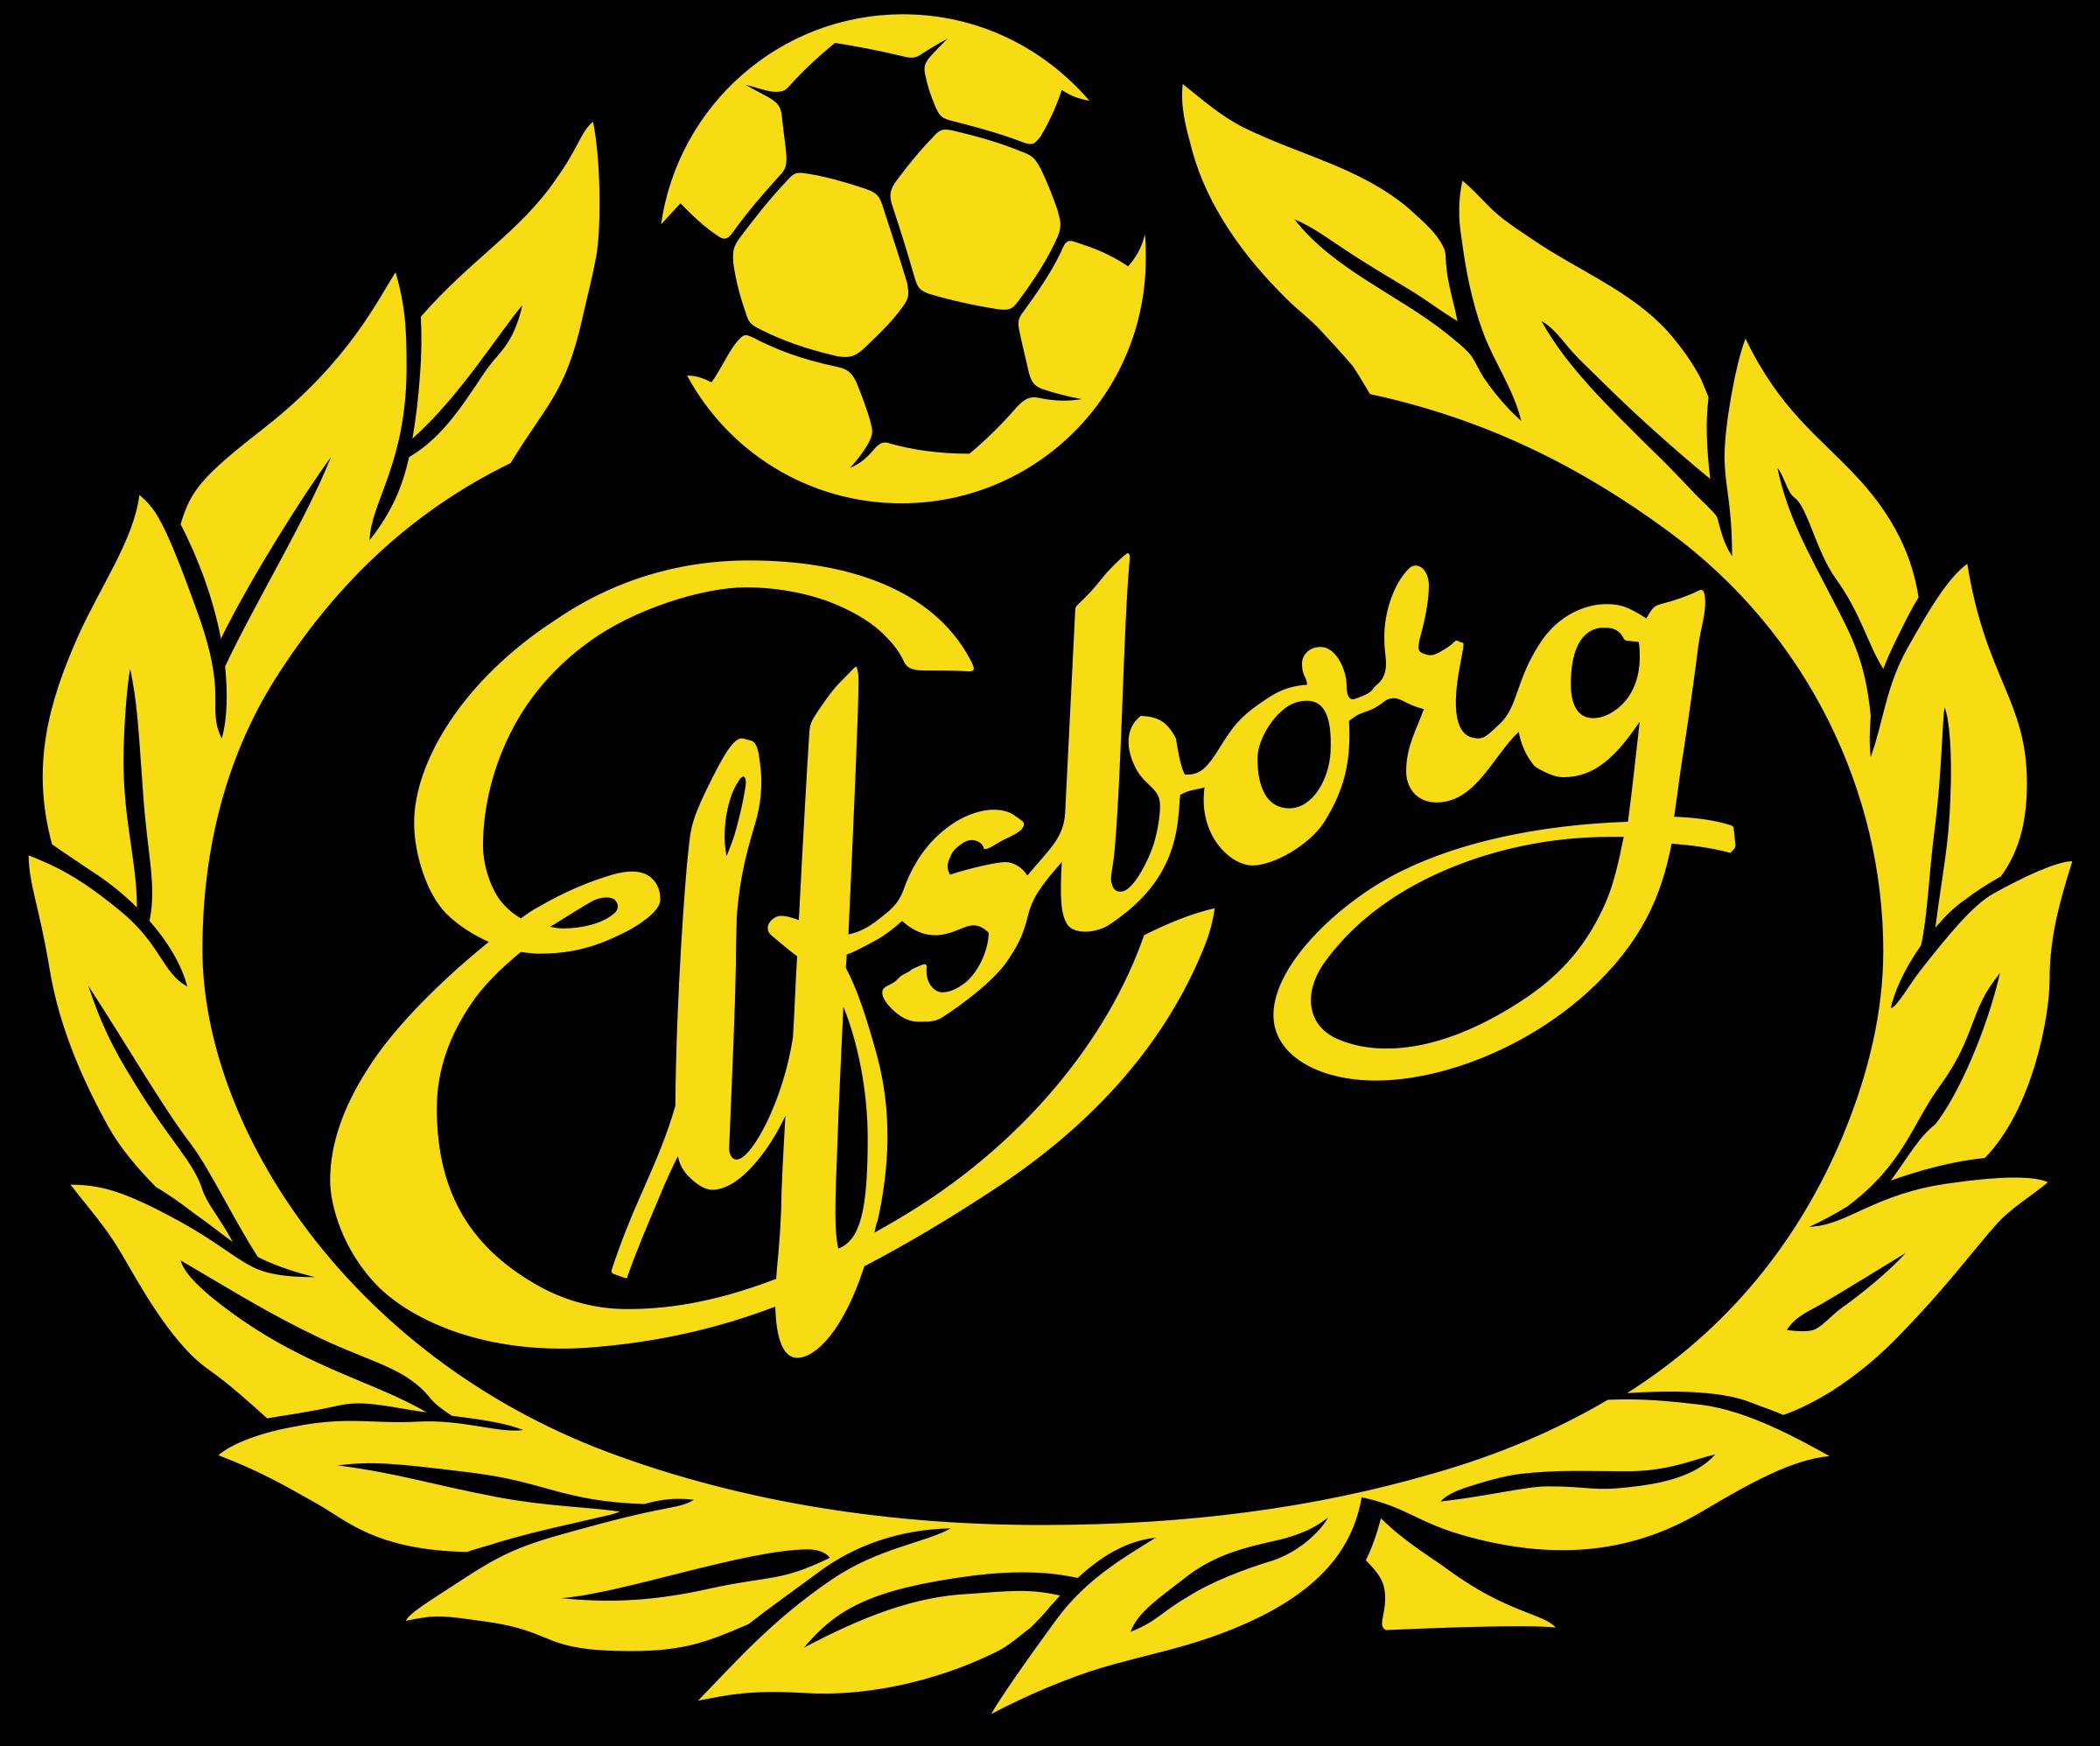 HERB ELFSBORG